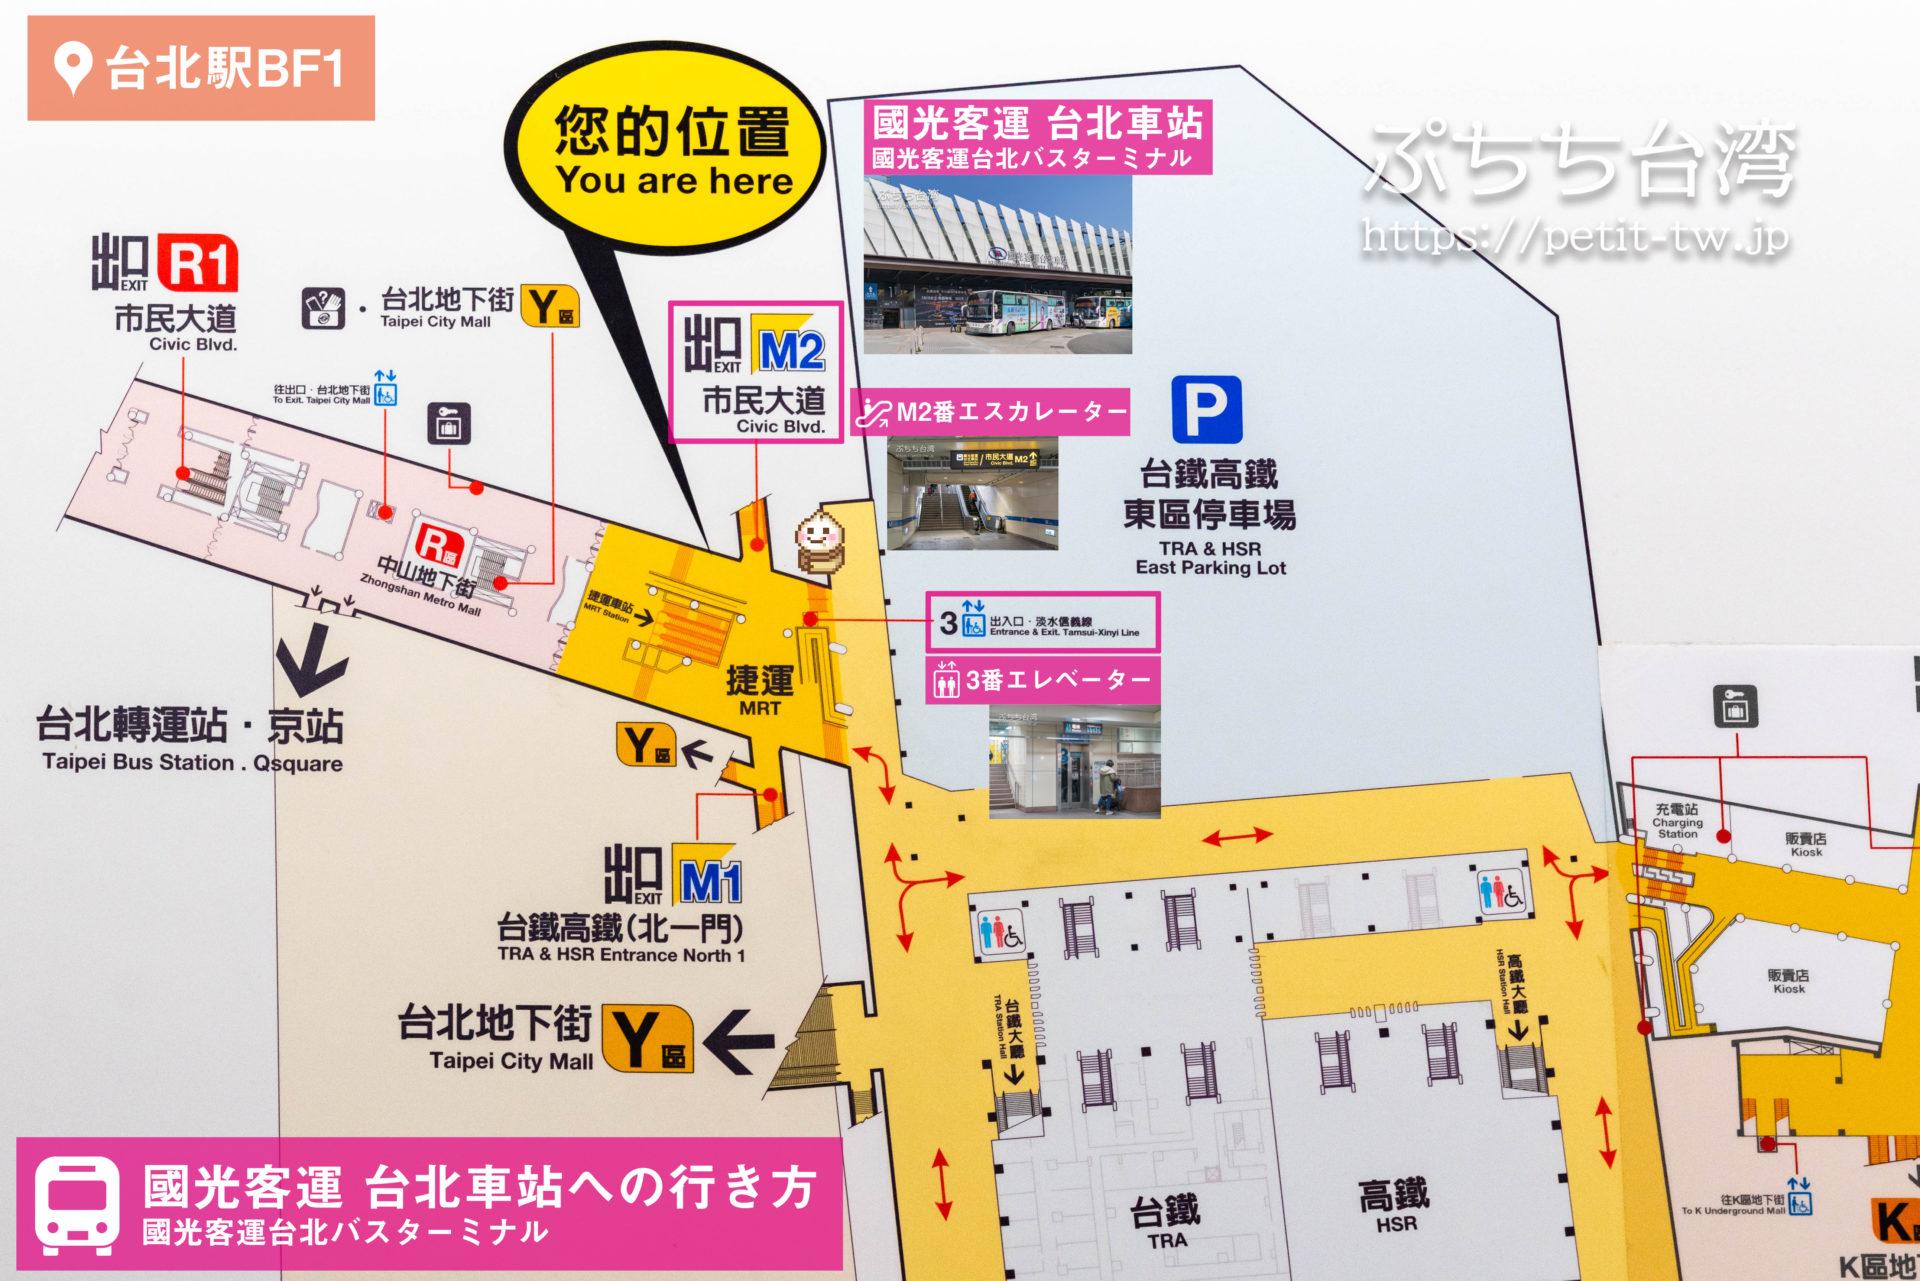 國光客運 台北車站の場所・行き方